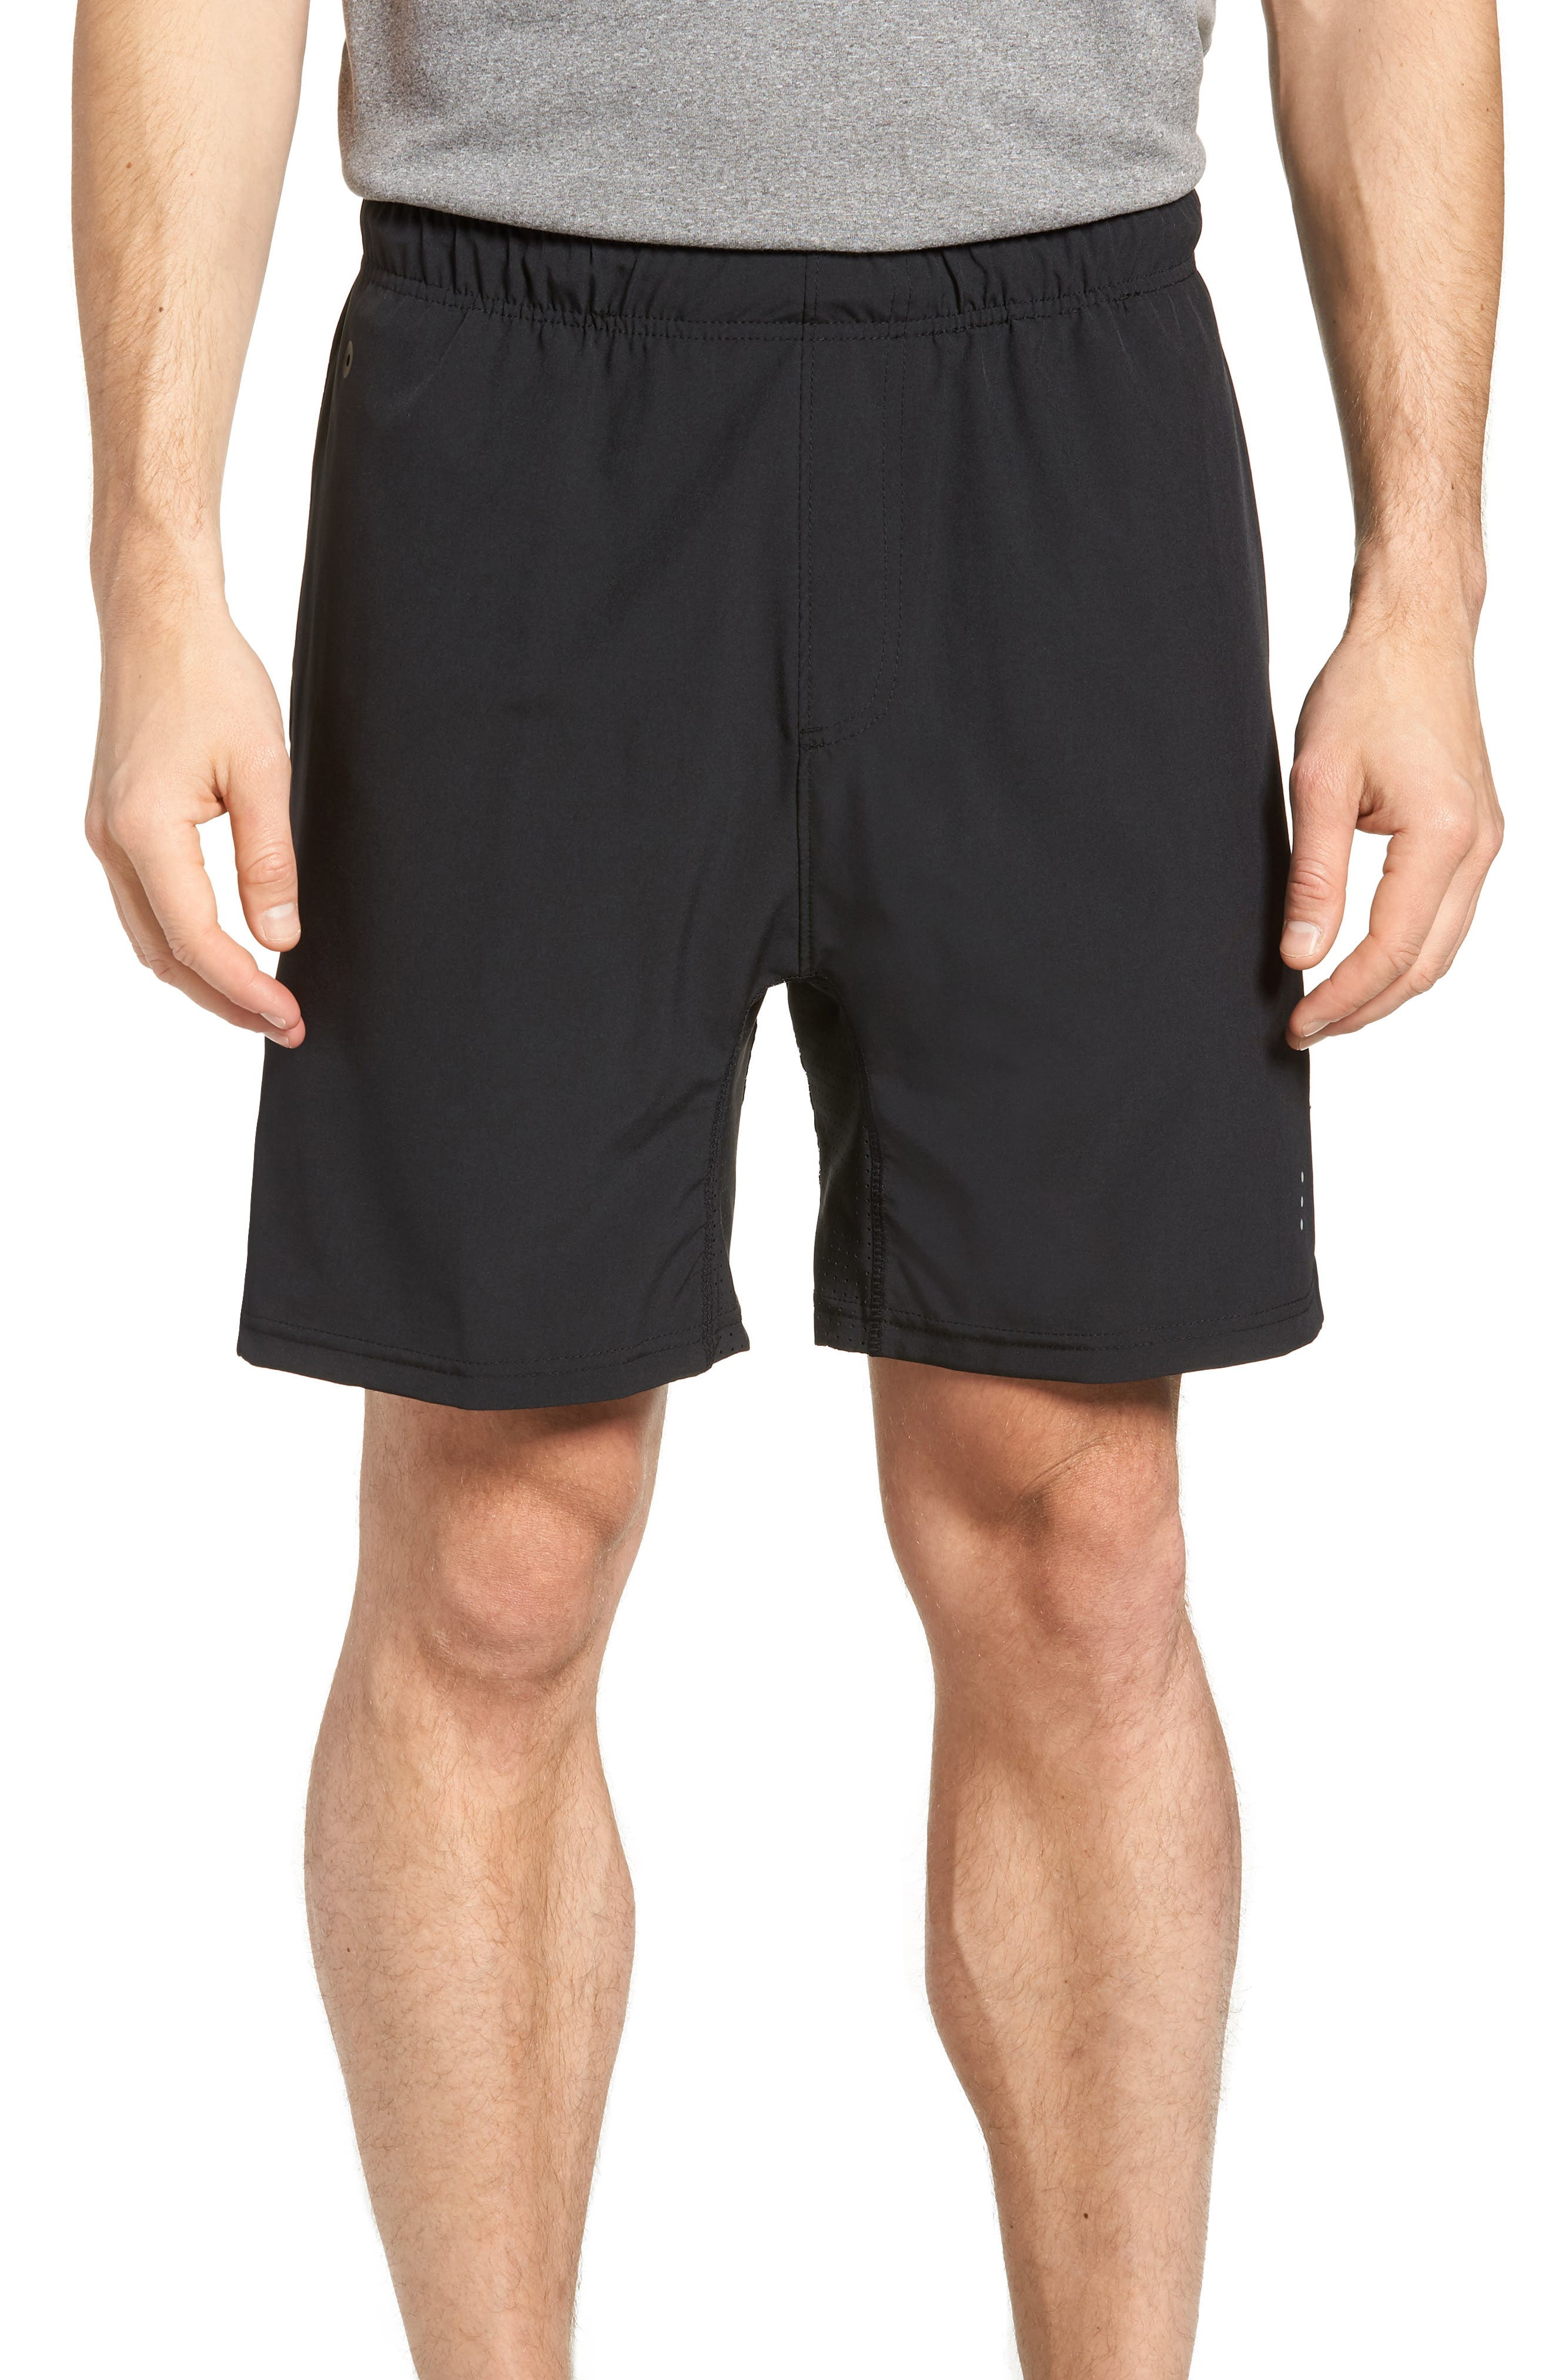 ZANEROBE Type 3 Tech Shorts,                             Main thumbnail 1, color,                             001